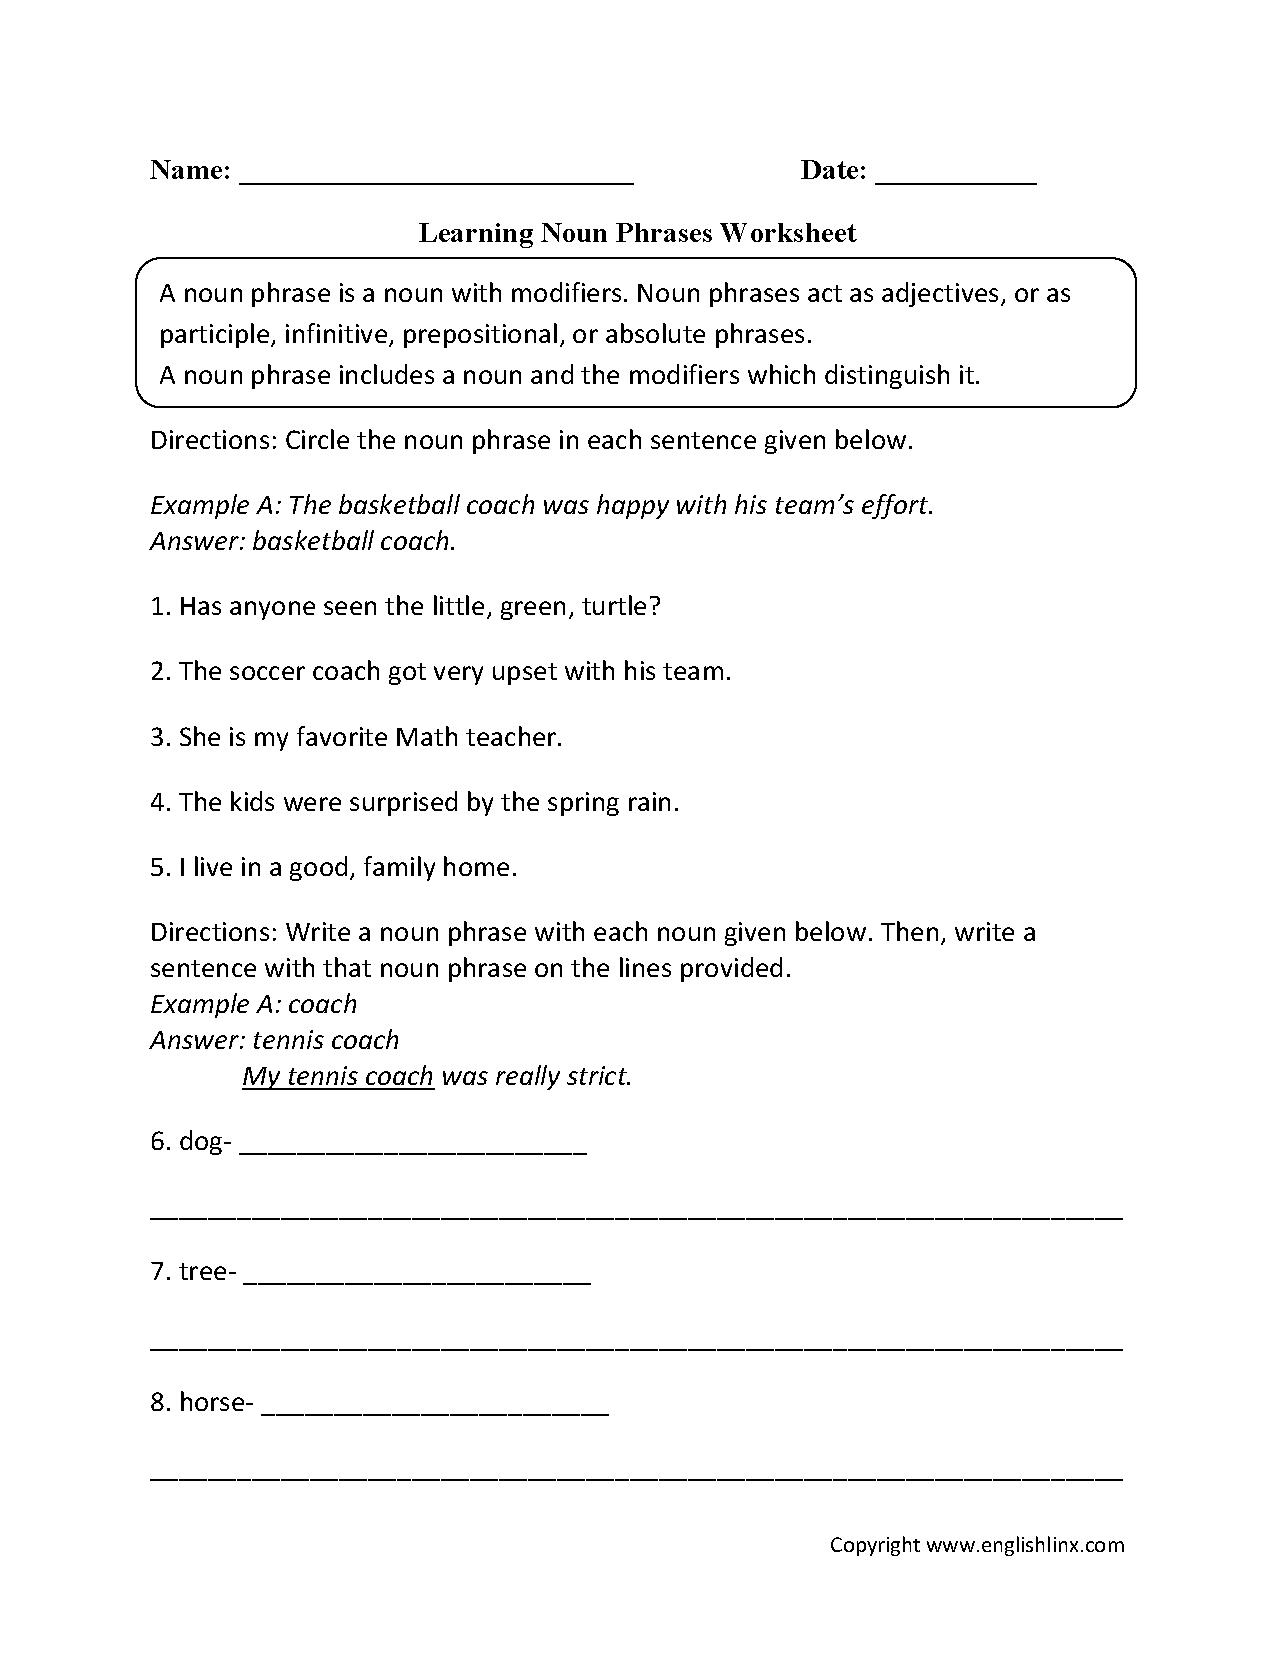 LESSON THREE - School of Choctaw Language